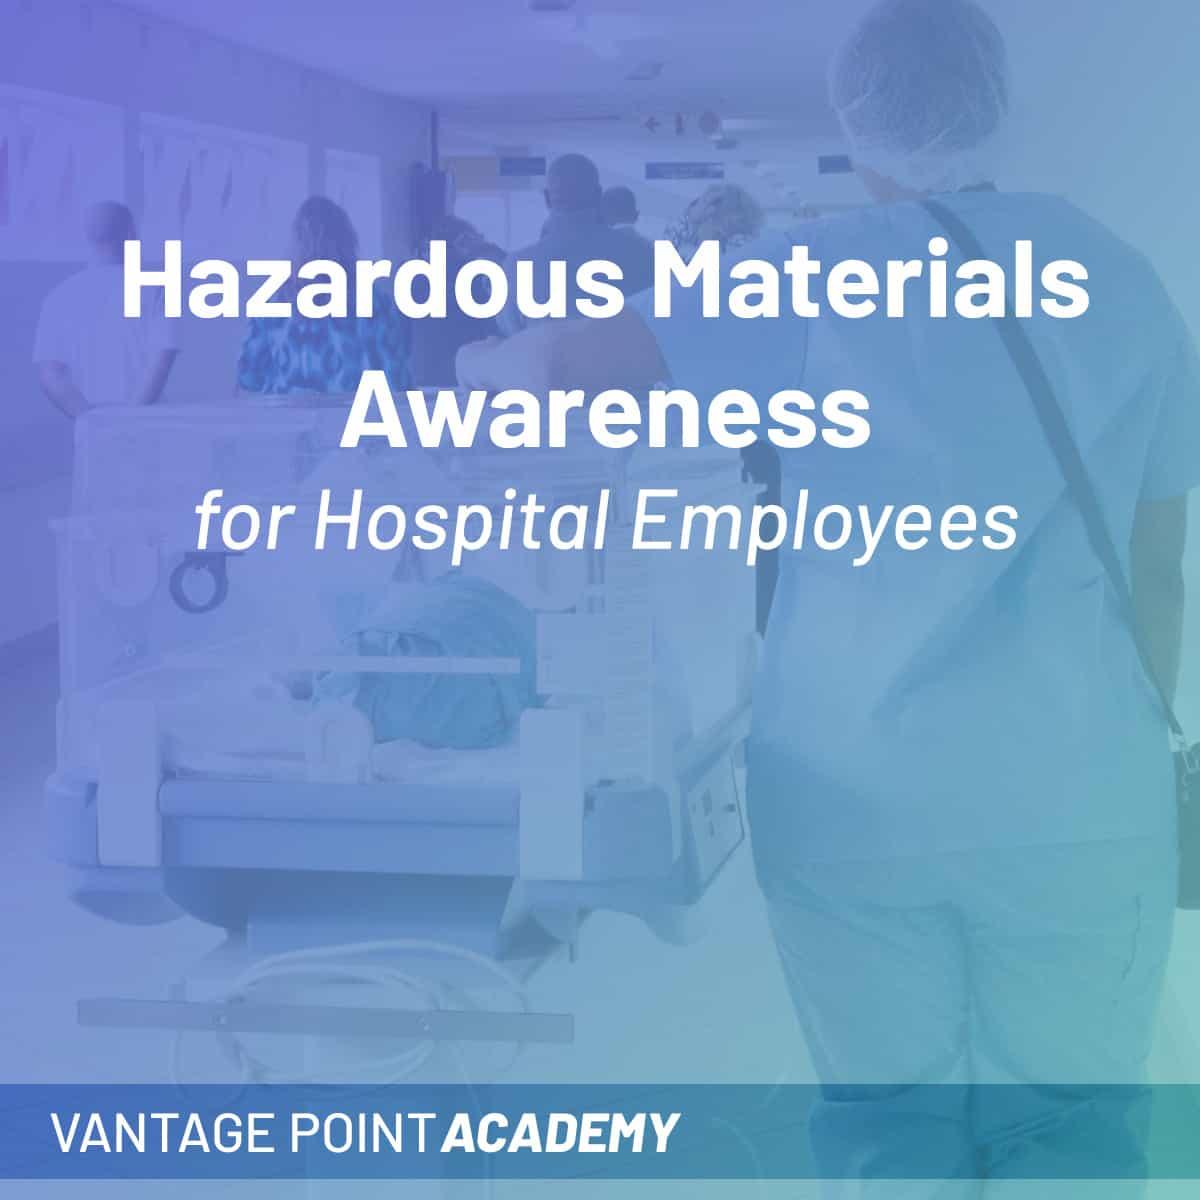 Hazardous Materials Awareness For Hospital Employees